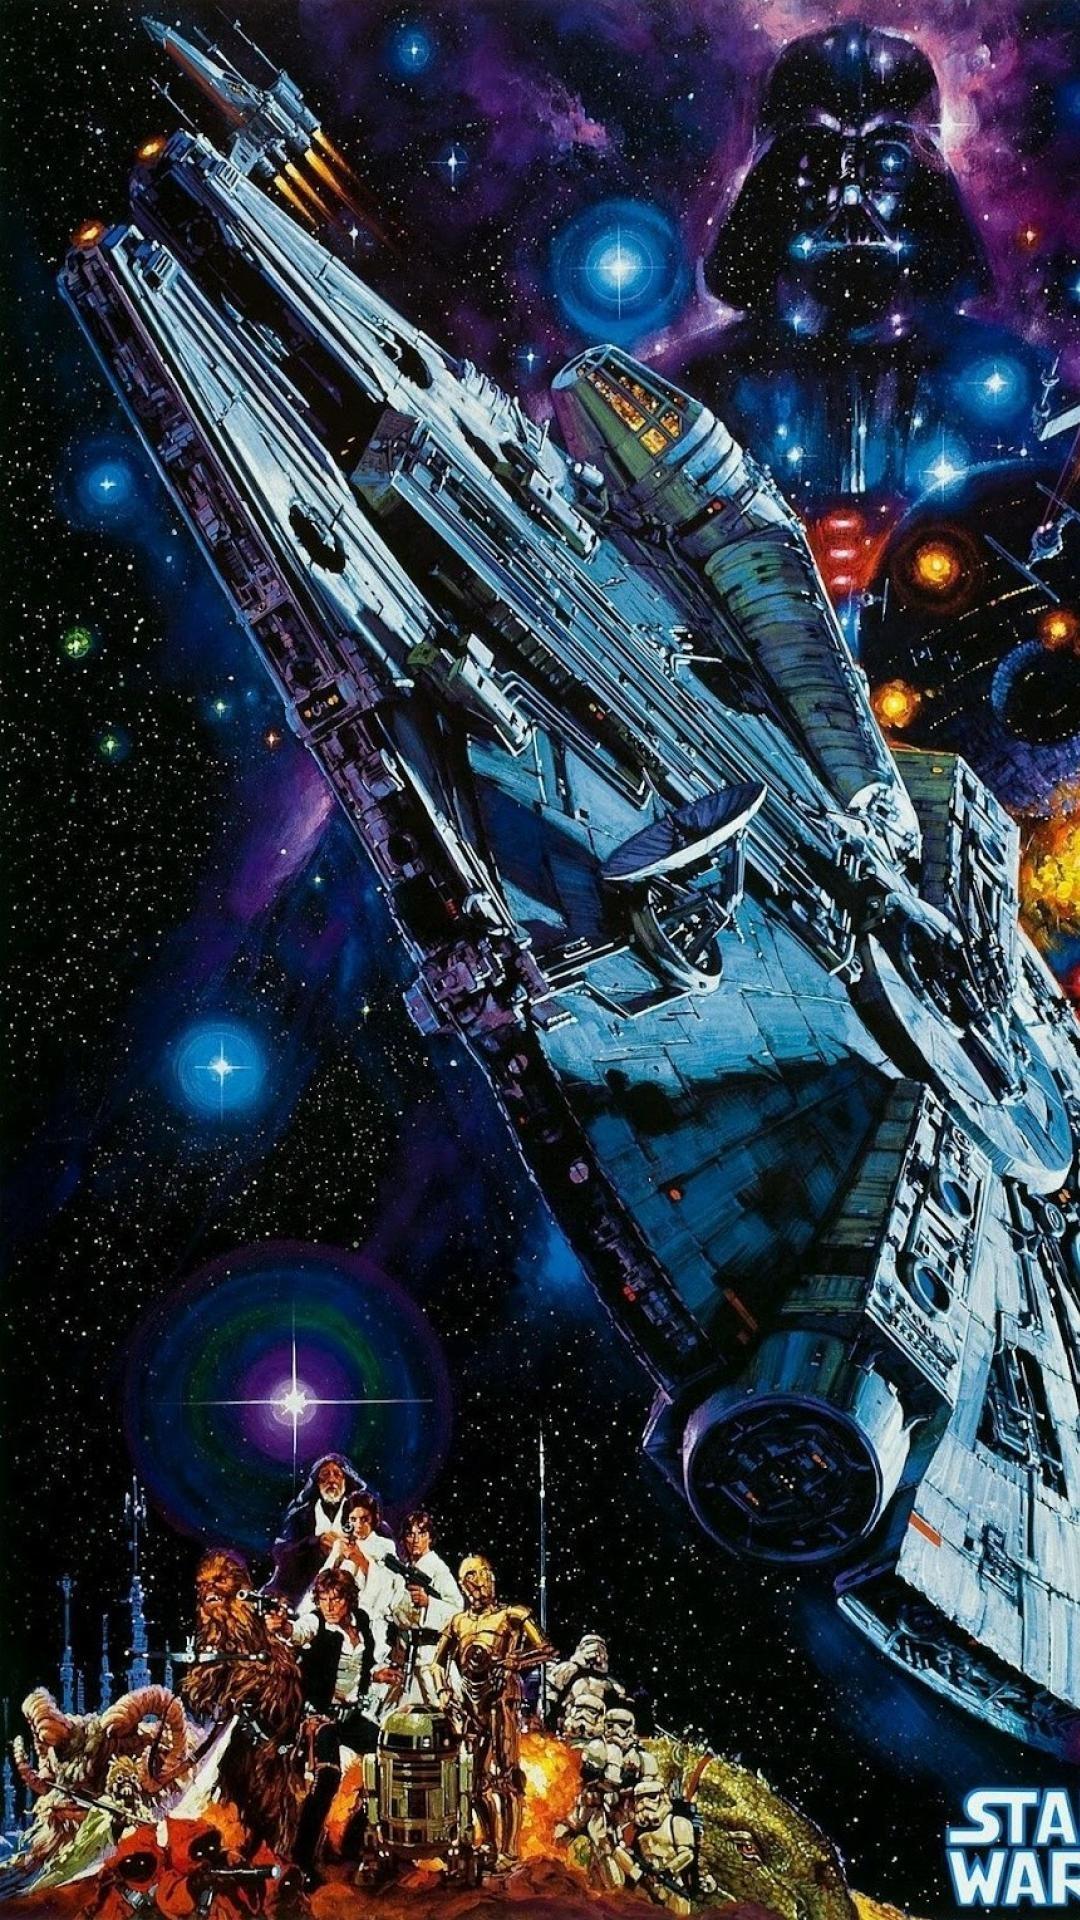 vader death star millennium falcon wars x-wing wallpaper | (80665 .